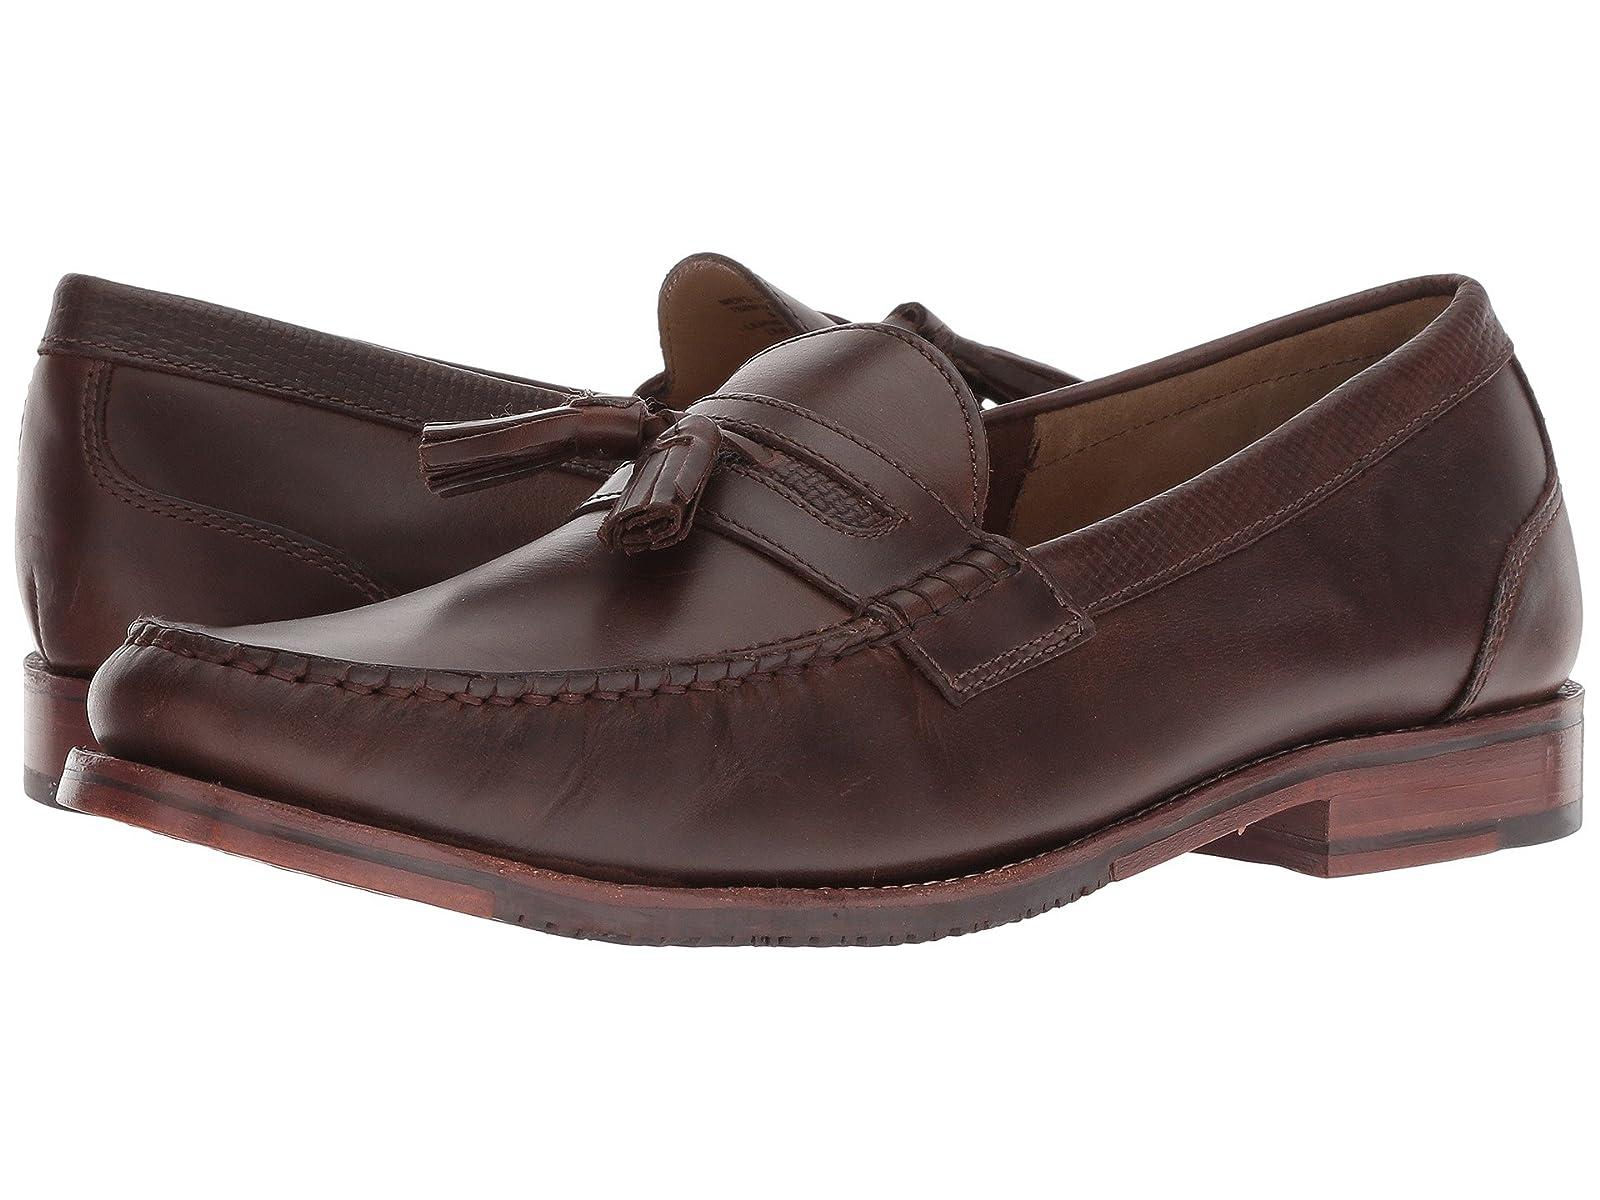 Tommy Bahama TasslingtonAtmospheric grades have affordable shoes